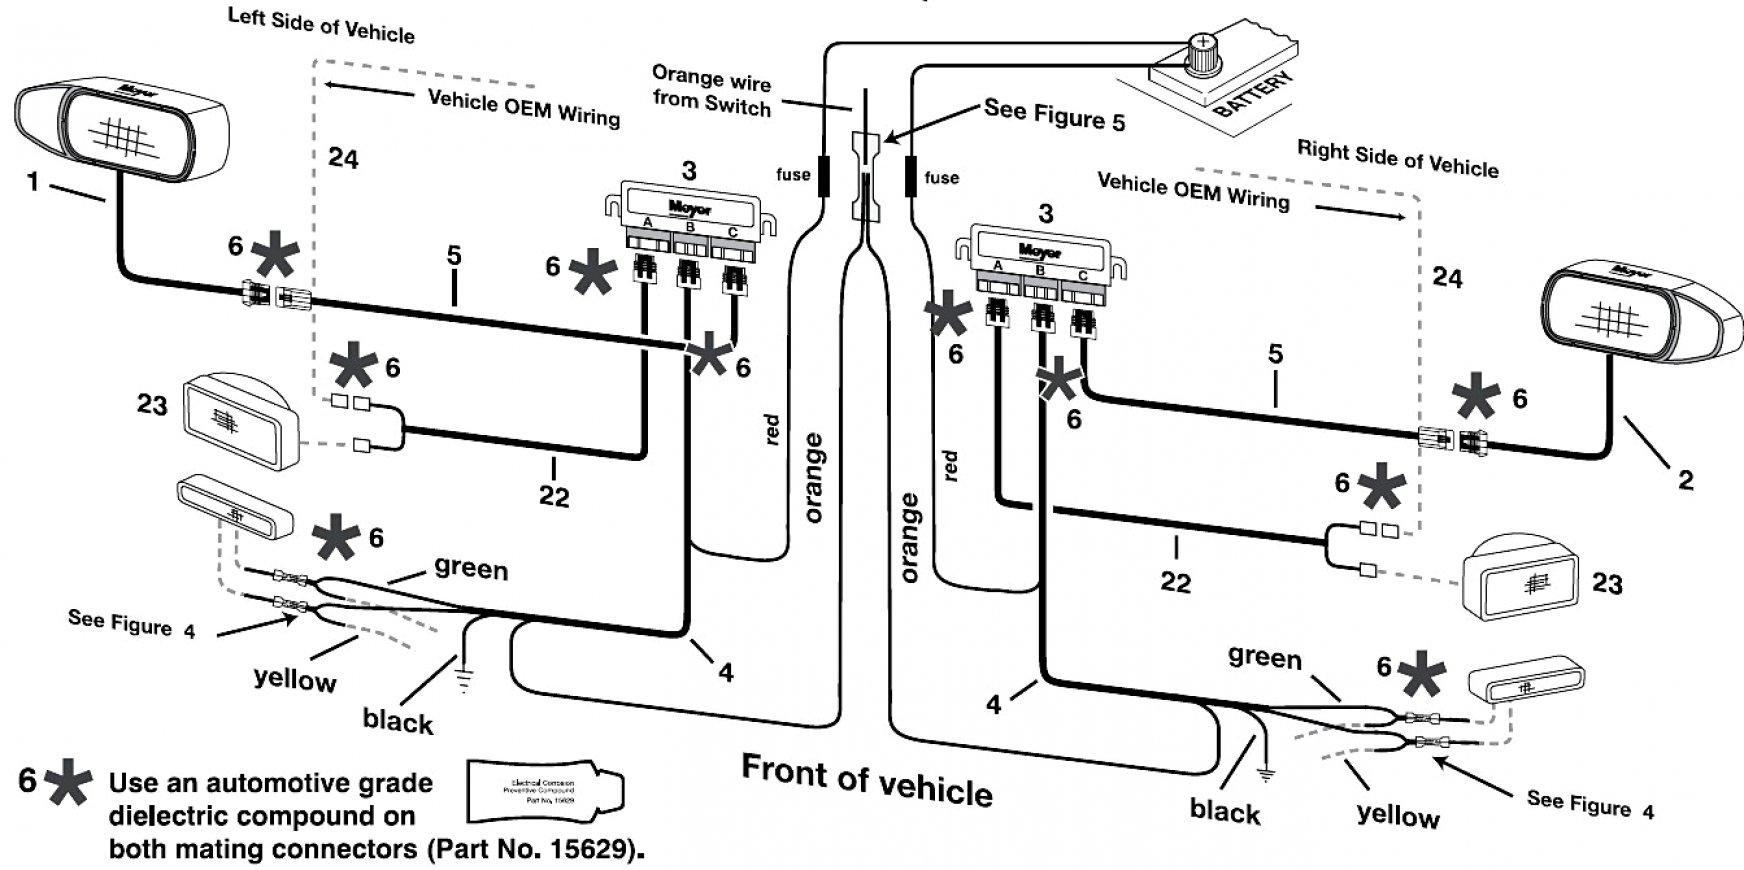 Blizzard Snow Plow Headlight Wiring Harness - Wiring Diagram Data - Western Snow Plows Wiring Diagram